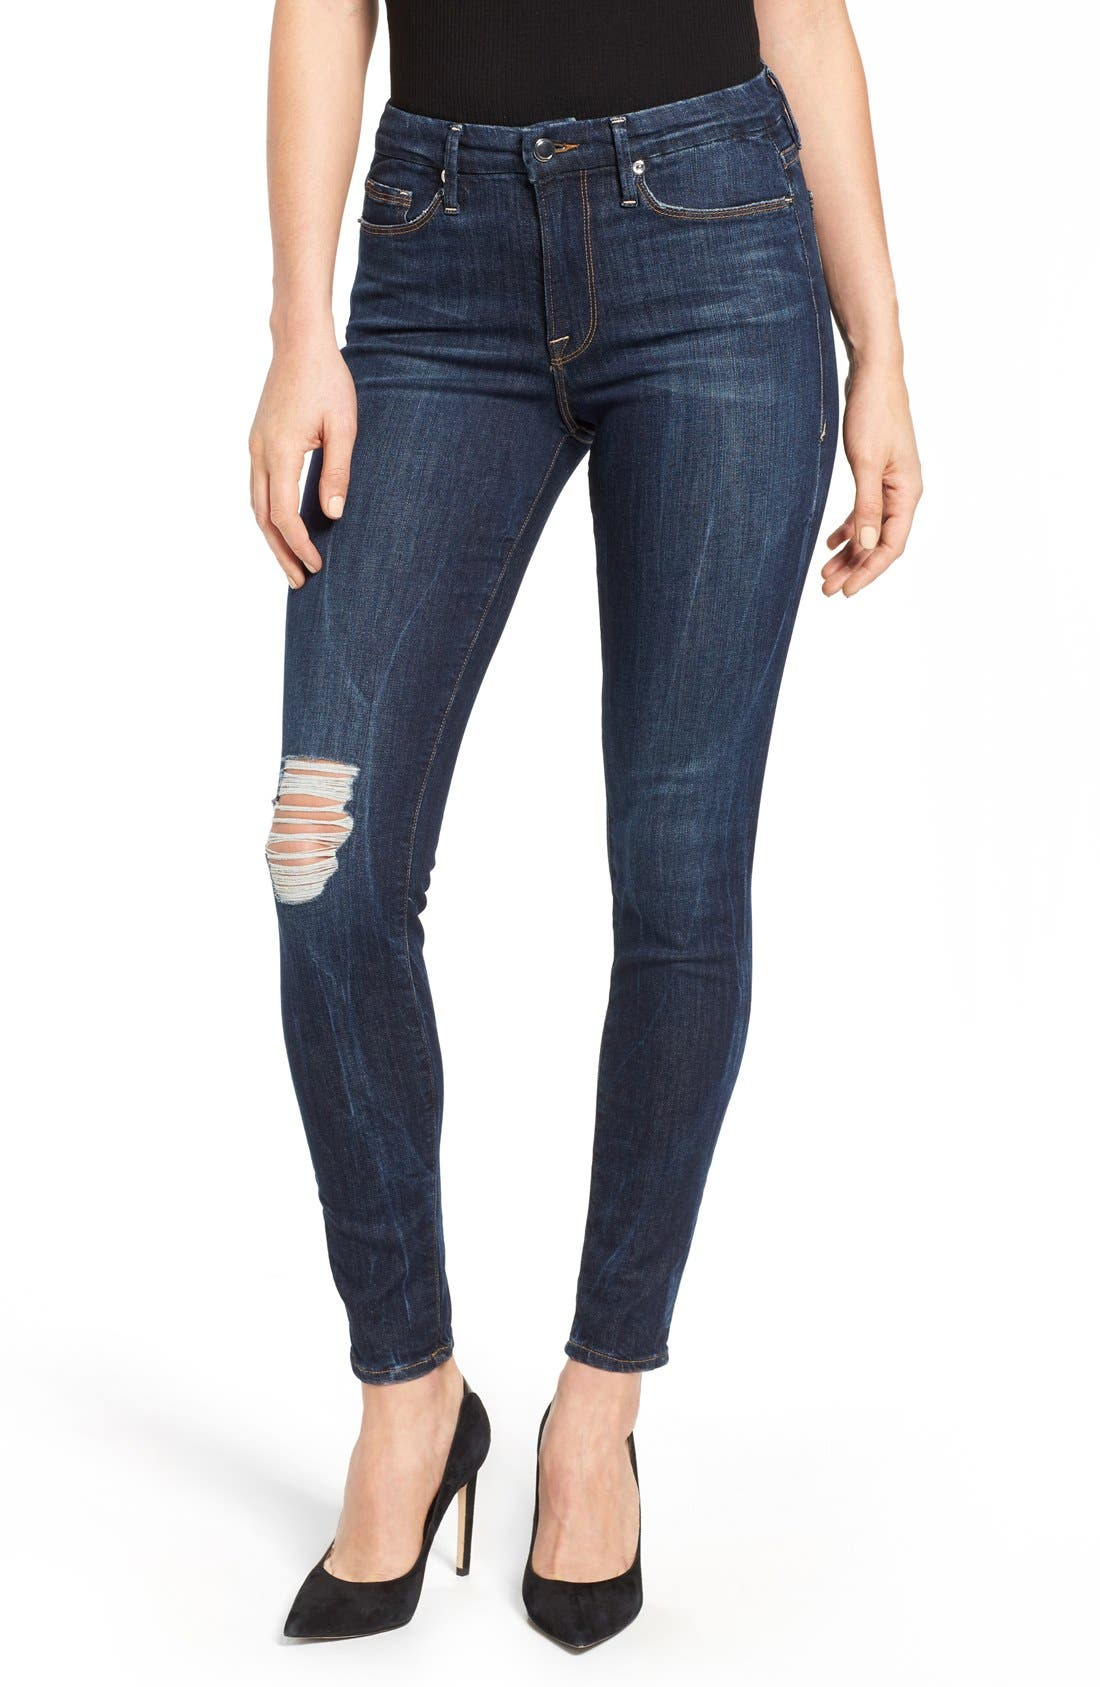 Alternate Image 1 Selected - Good American Good Legs Ripped Skinny Jeans